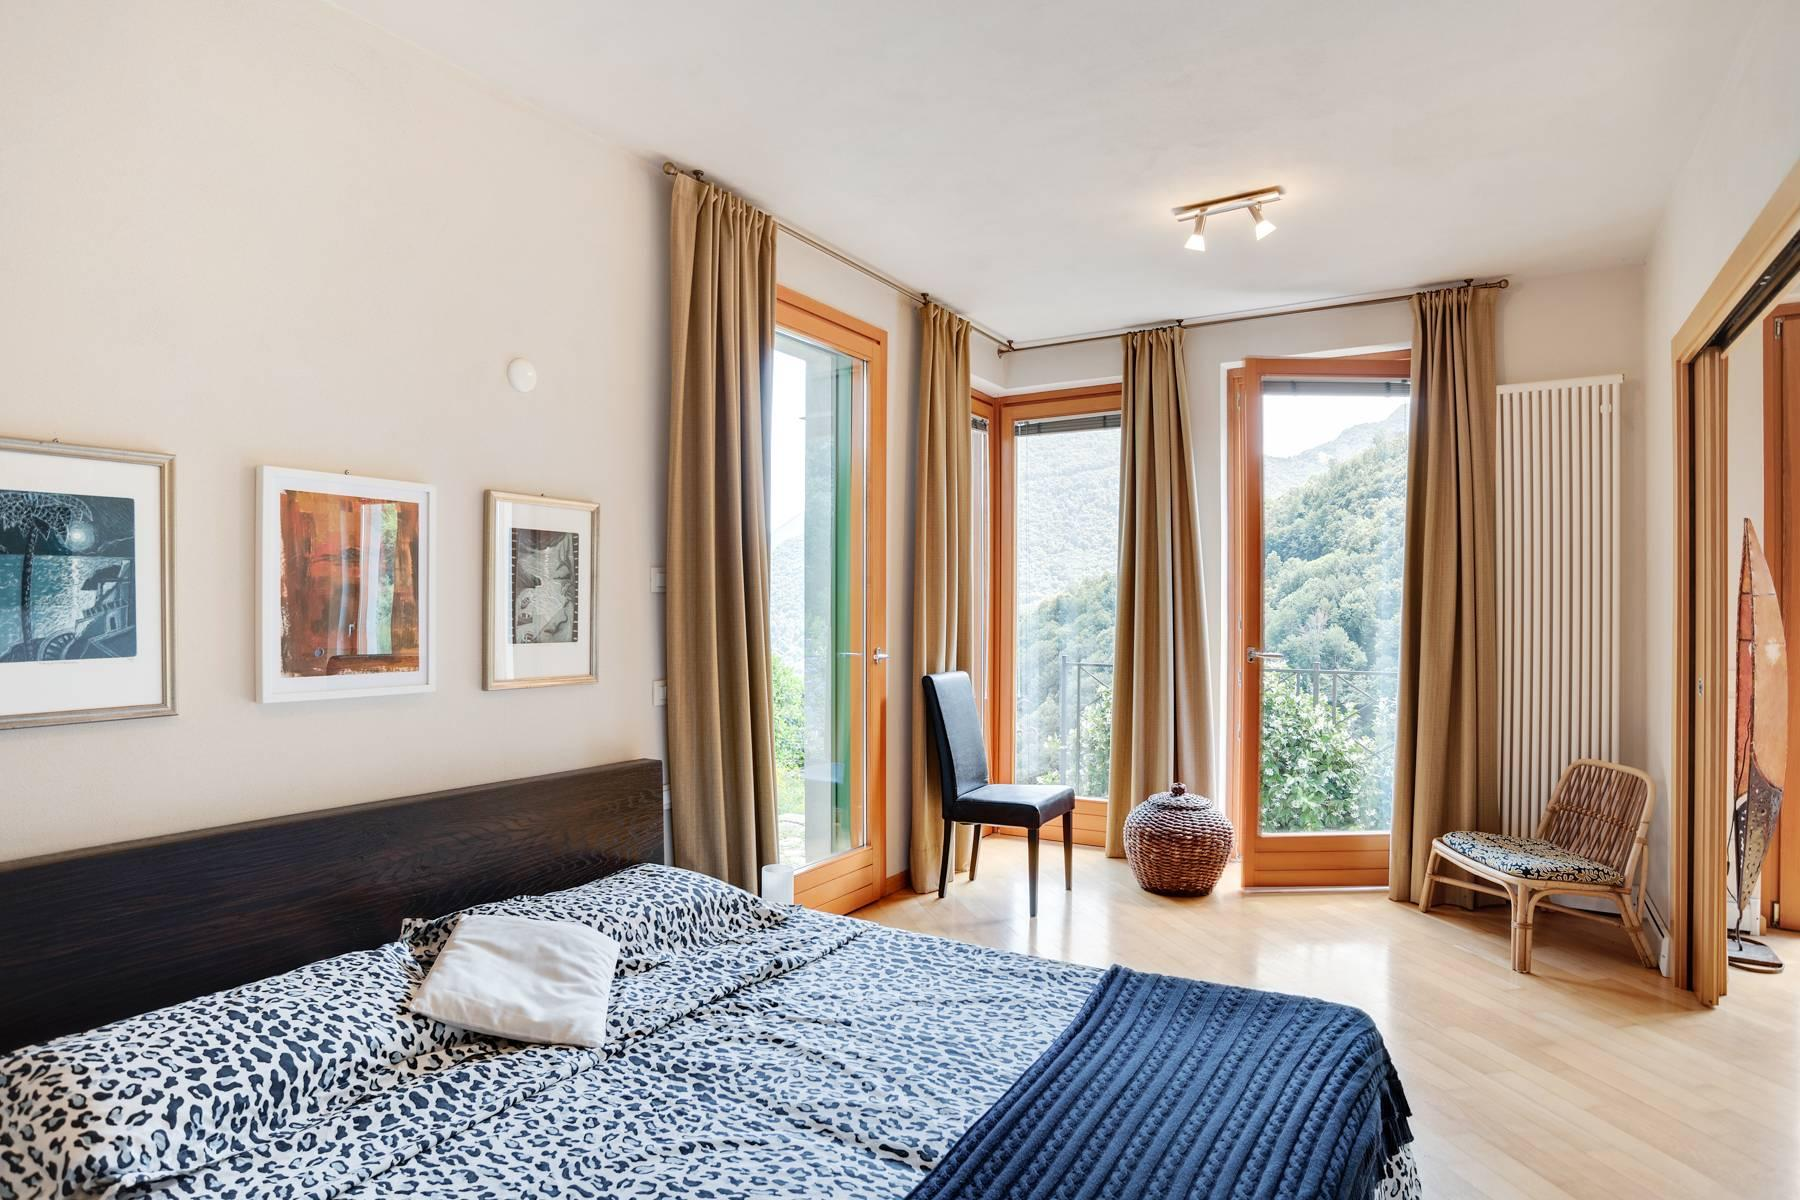 Splendida villa moderna sulla collina soleggiata sopra Argegno - 40